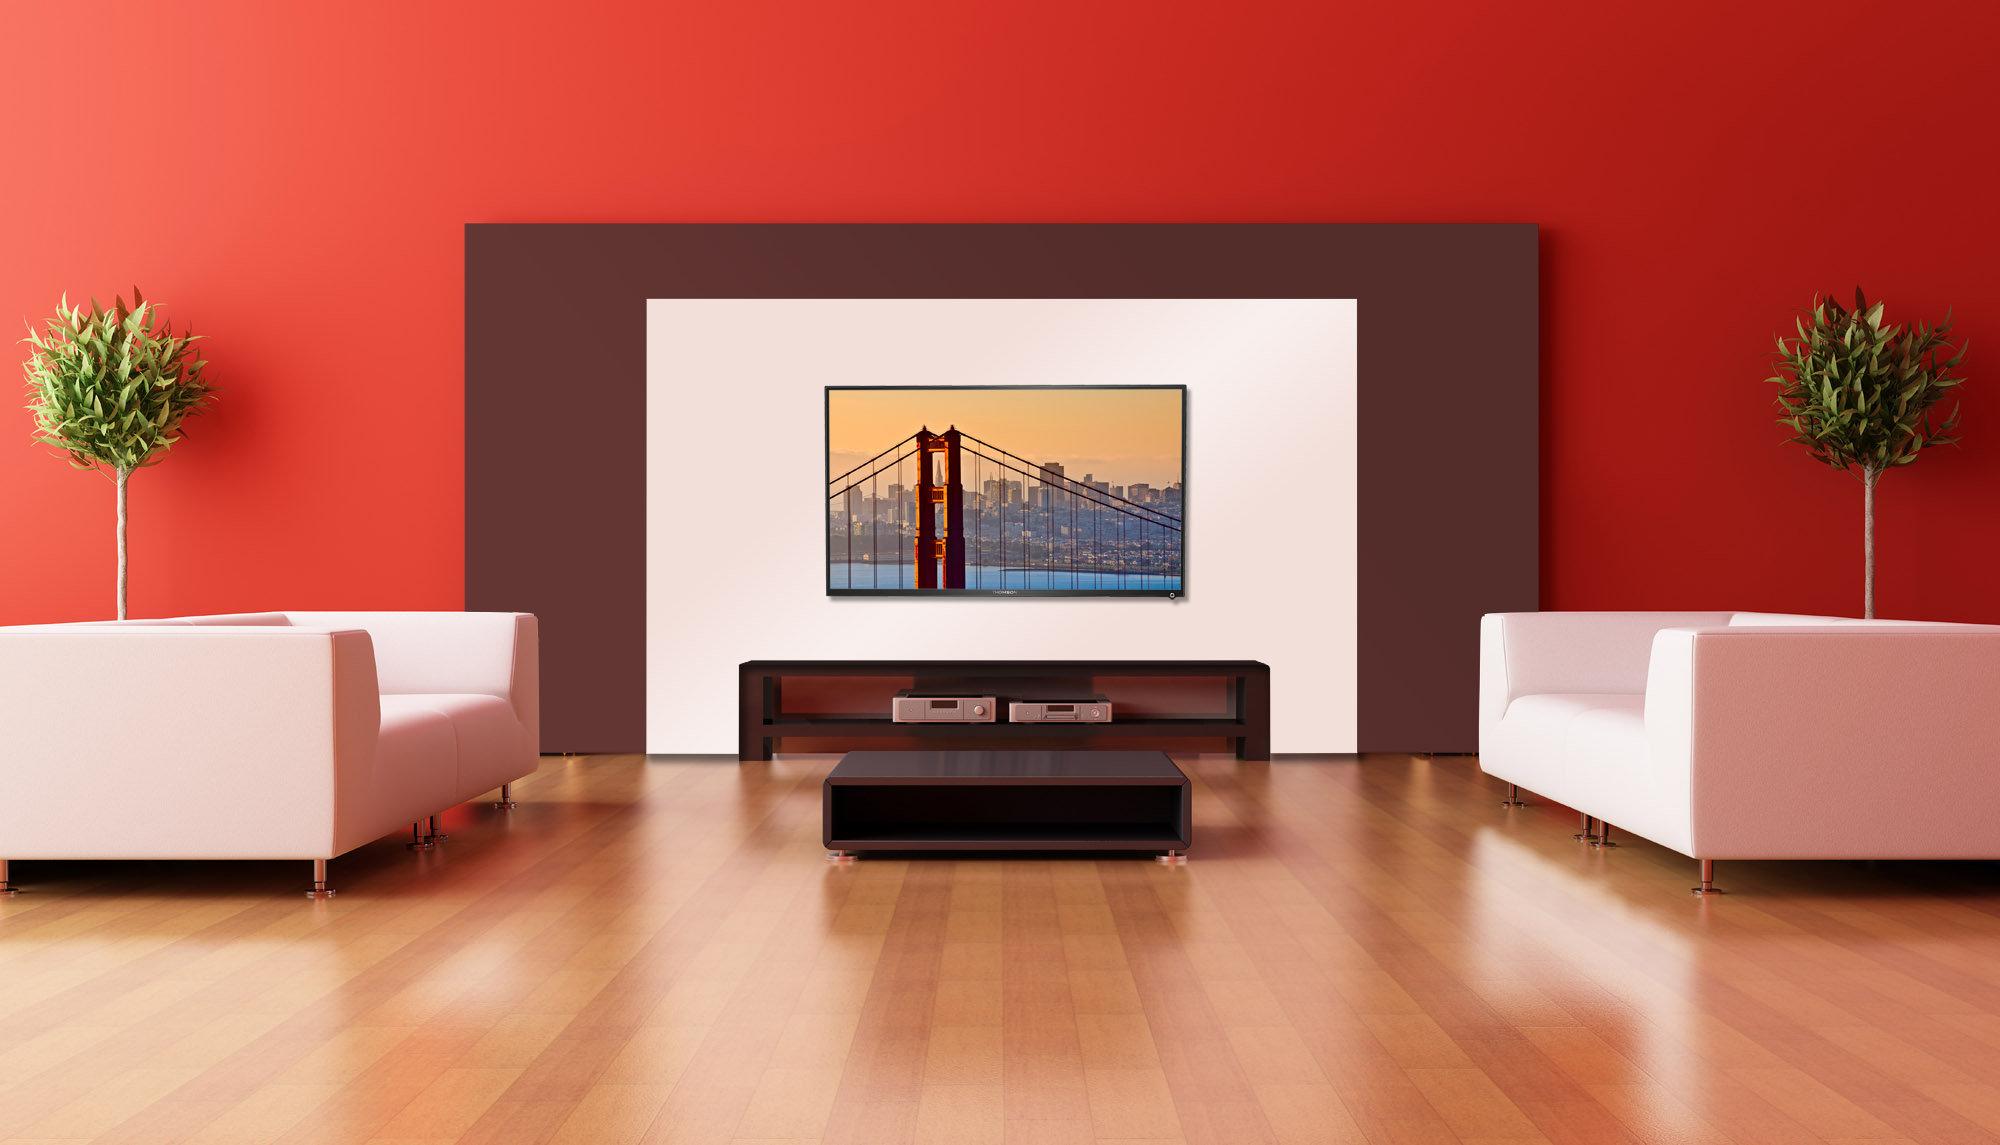 fernseher thomson 46fu5553 117 cm 46 zoll led backlight. Black Bedroom Furniture Sets. Home Design Ideas